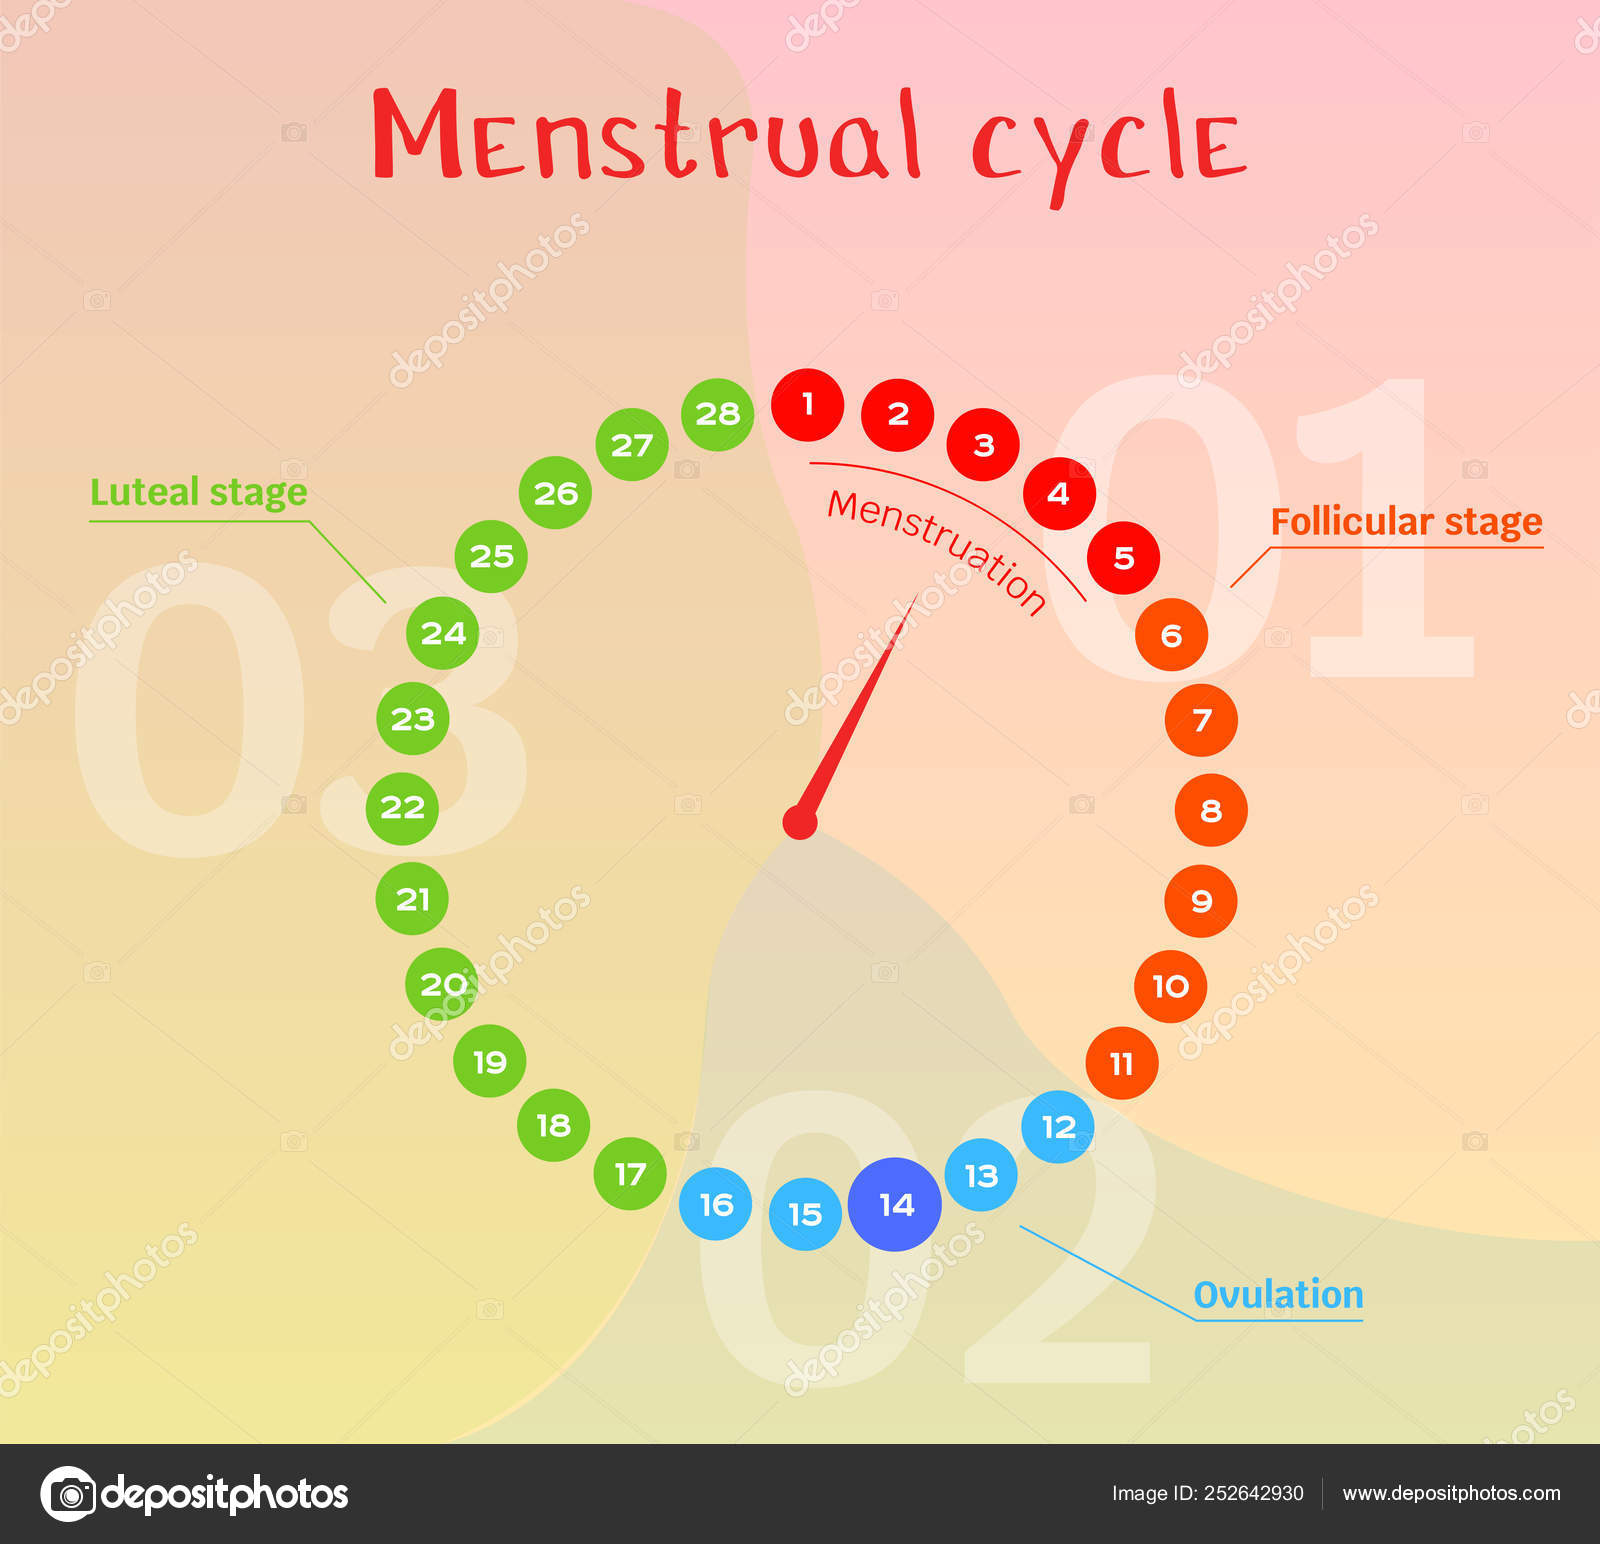 Calendario de ovulacao feminina